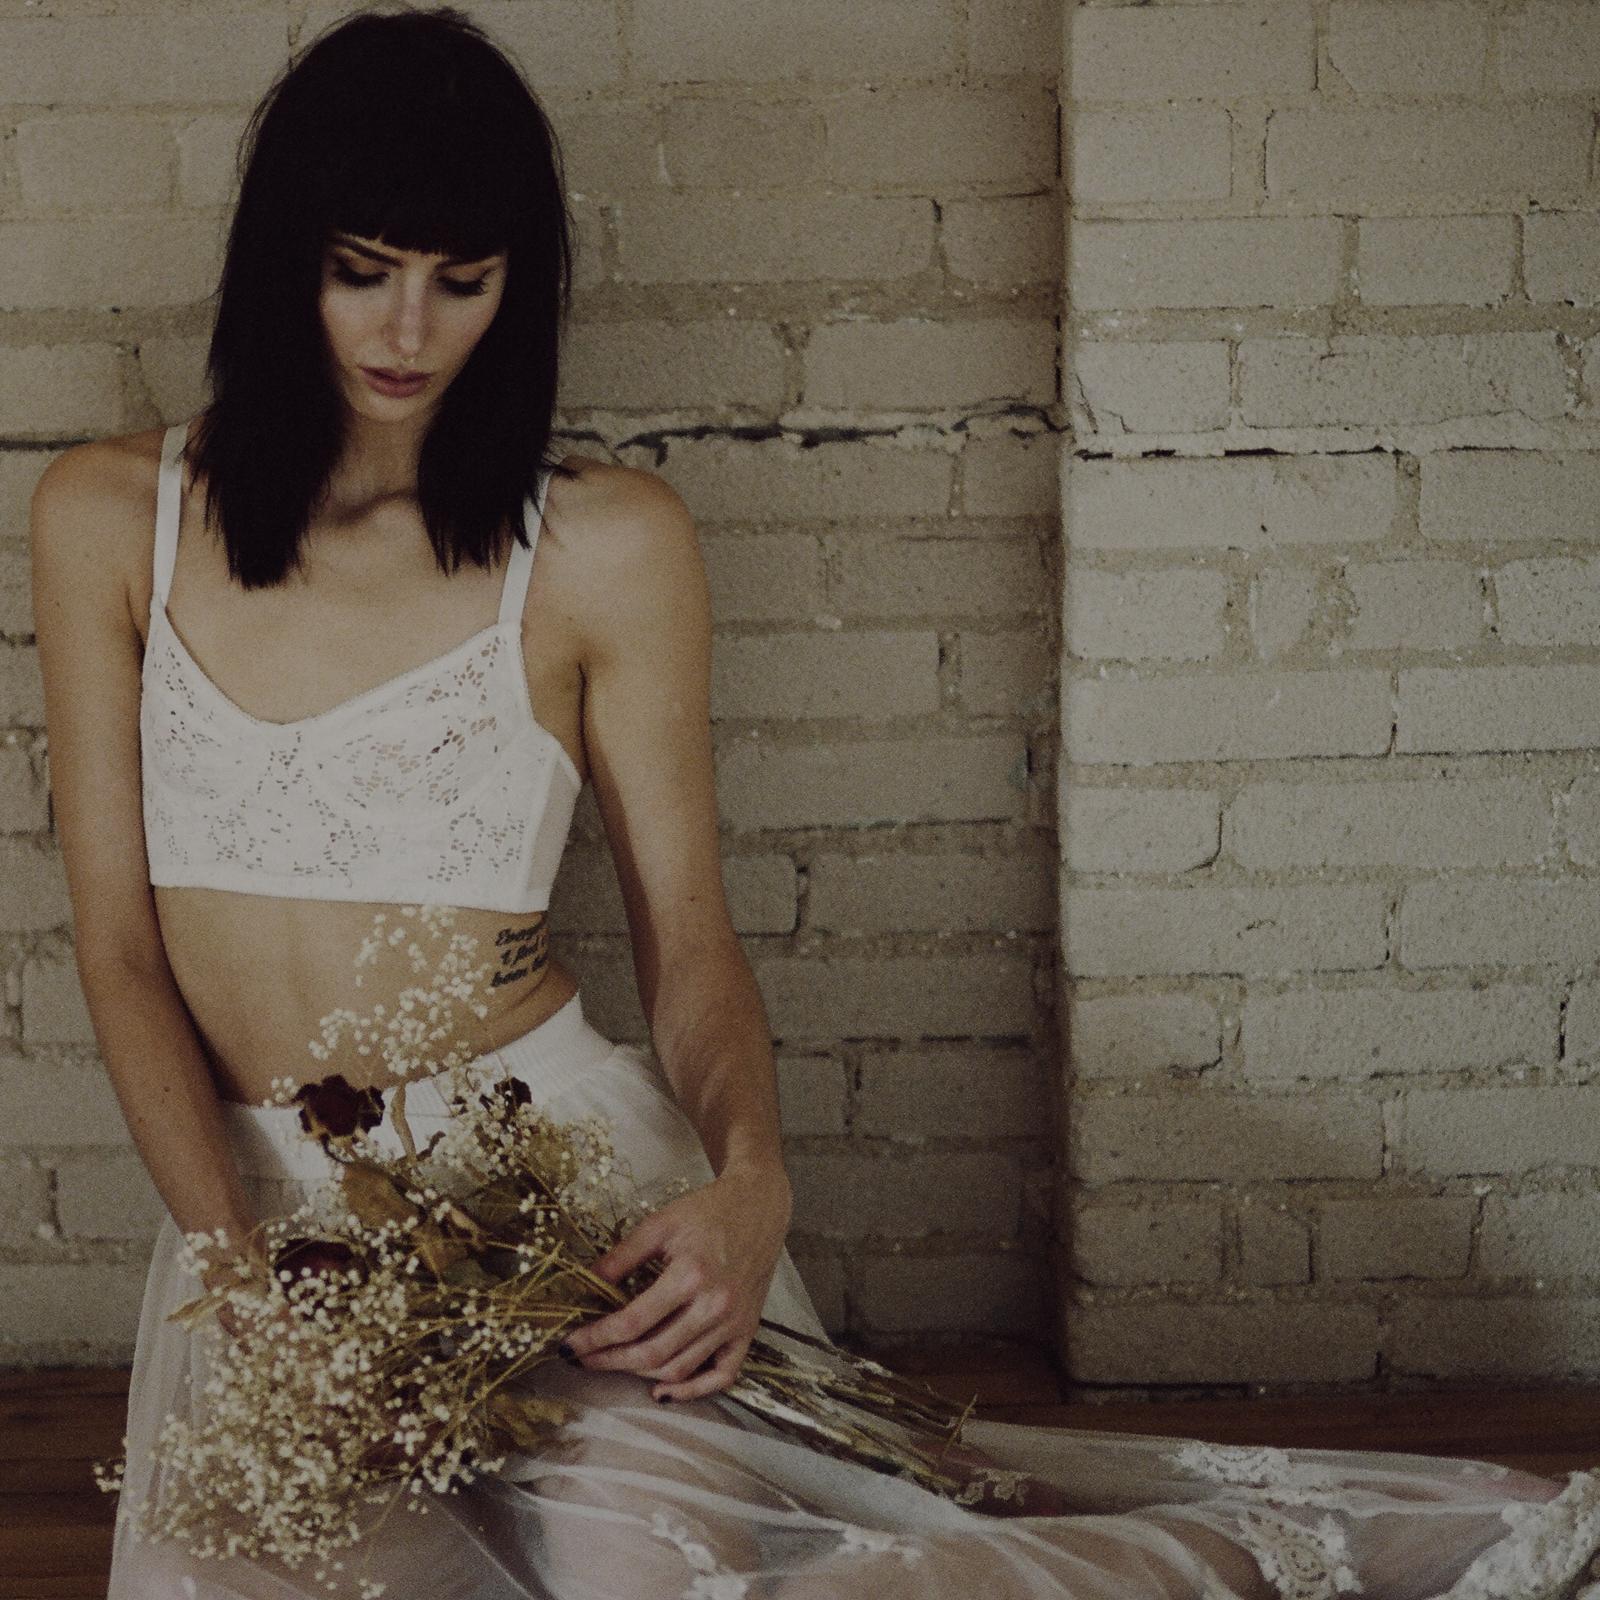 Jillian xenia photography 35mm film